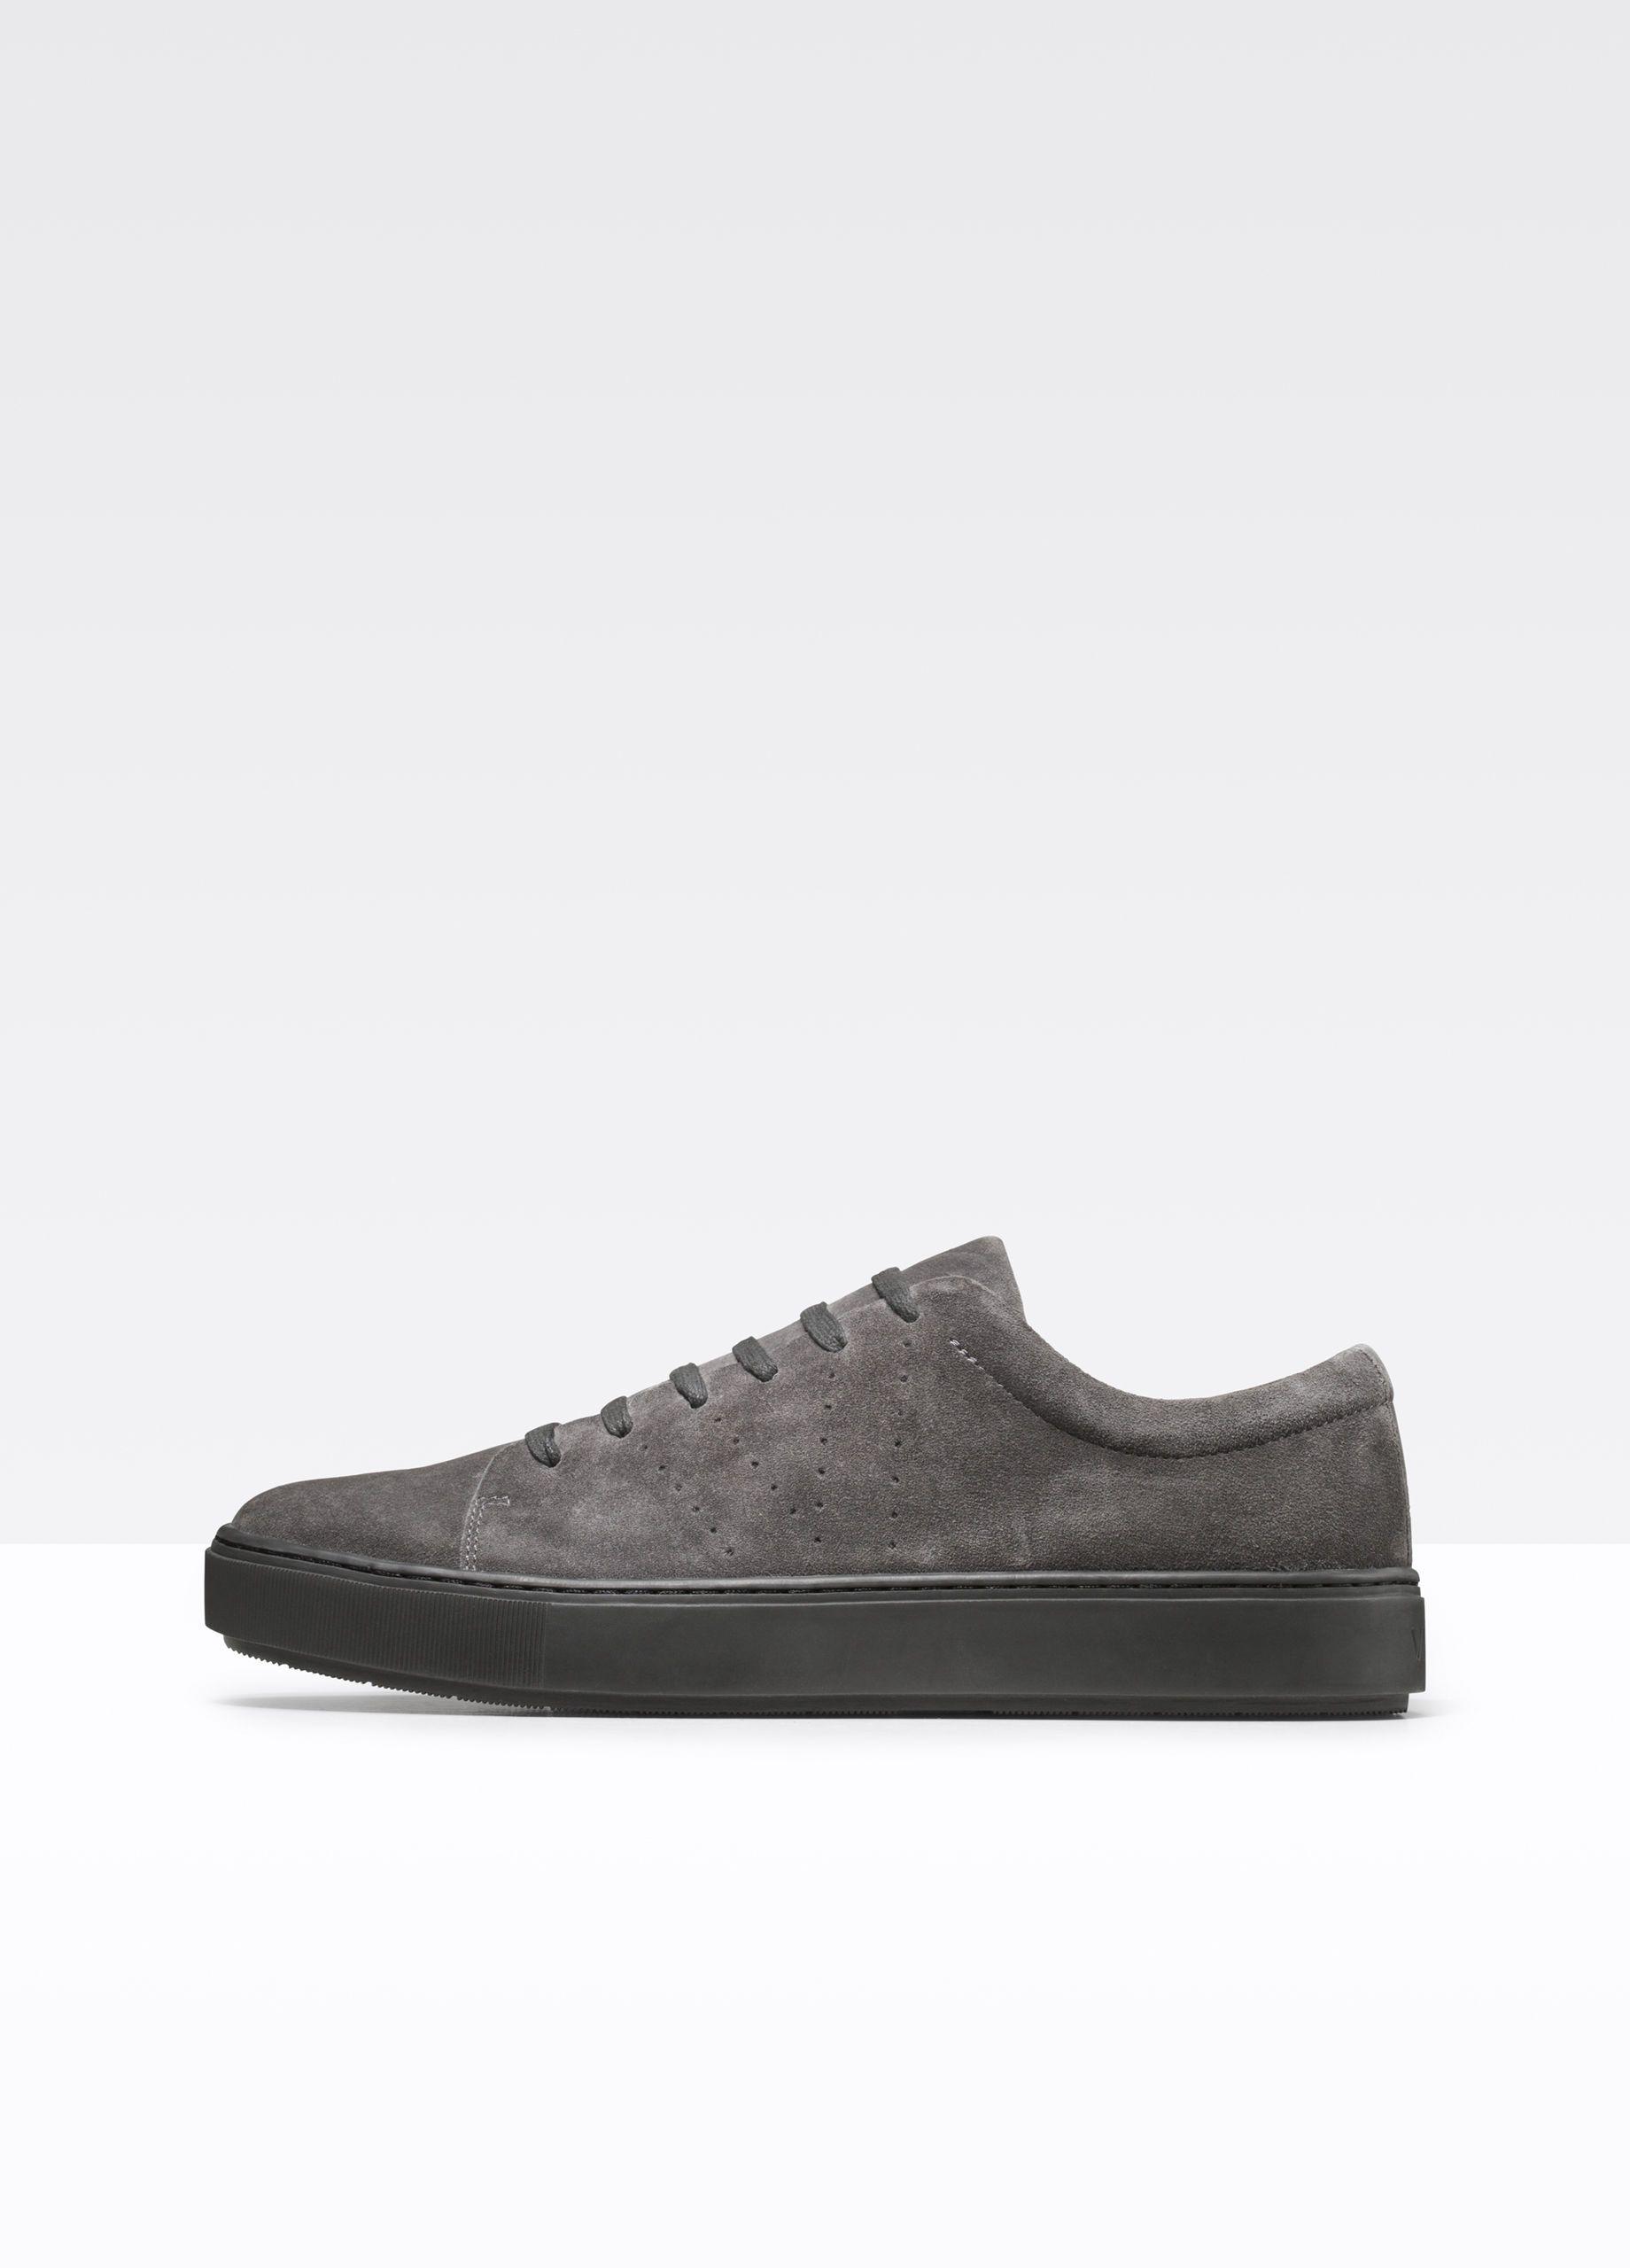 Luke Sport Suede Sneaker For Men Vince Mens Designer Shoes Sneakers All Black Sneakers